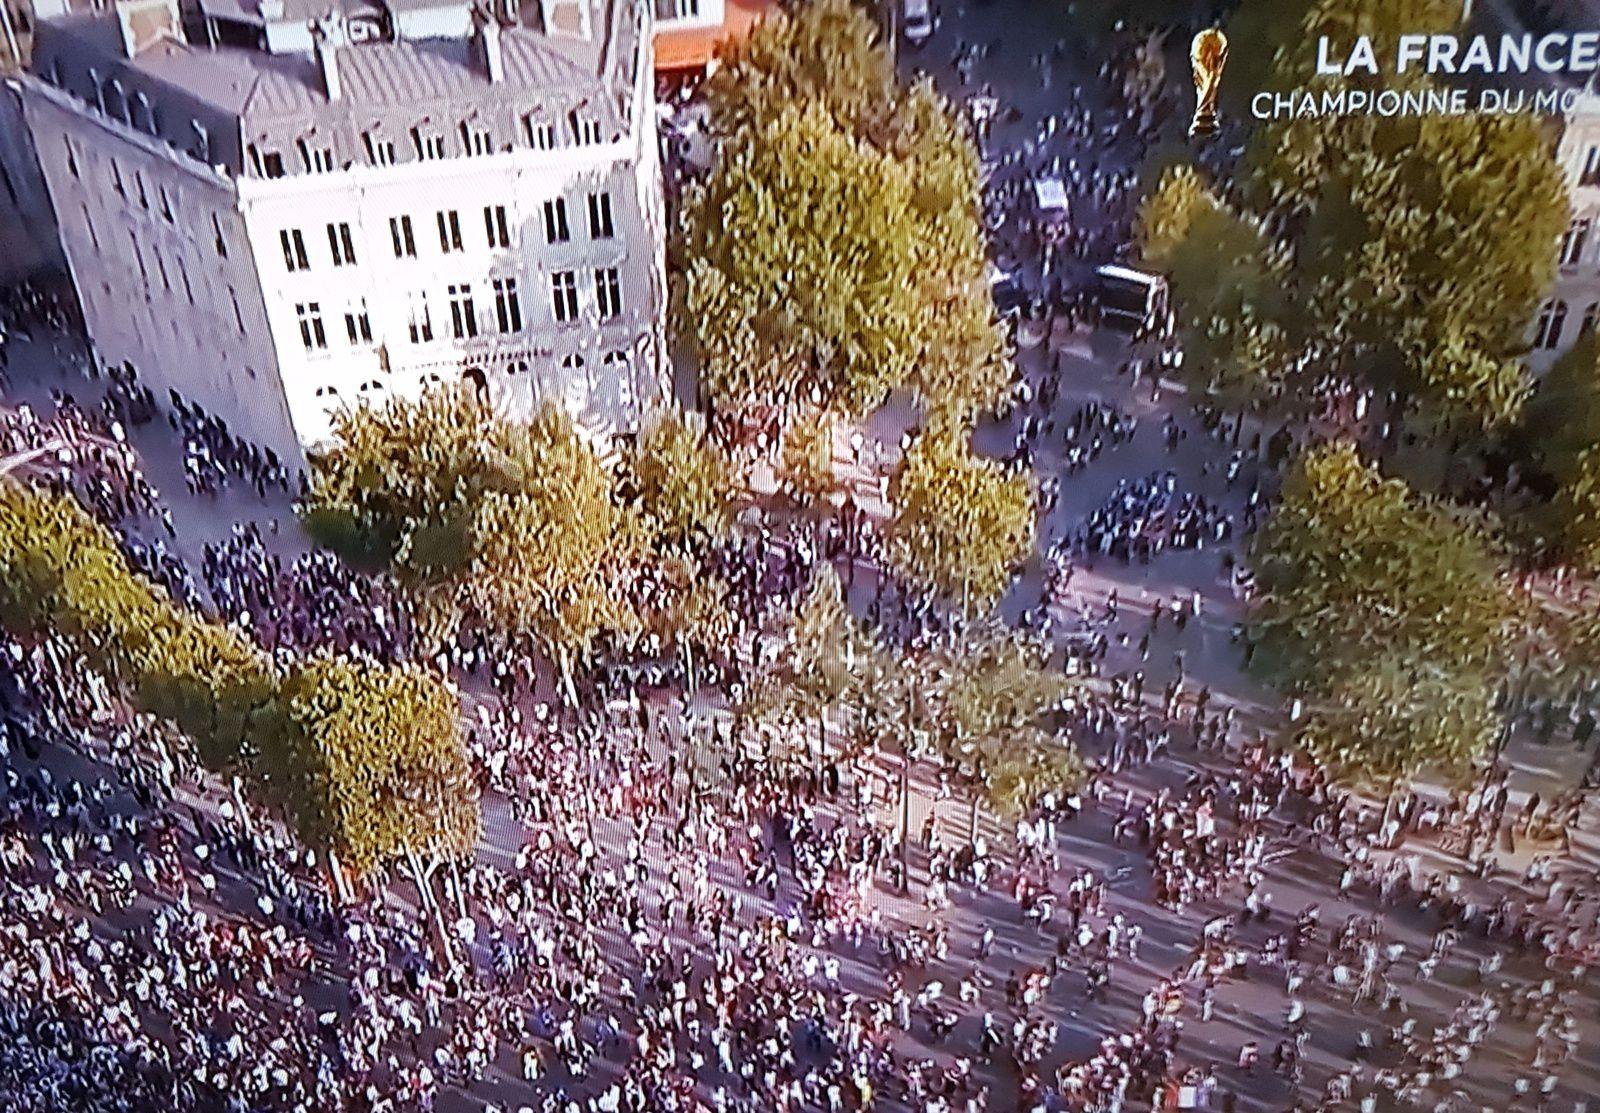 Bravo les Bleus !